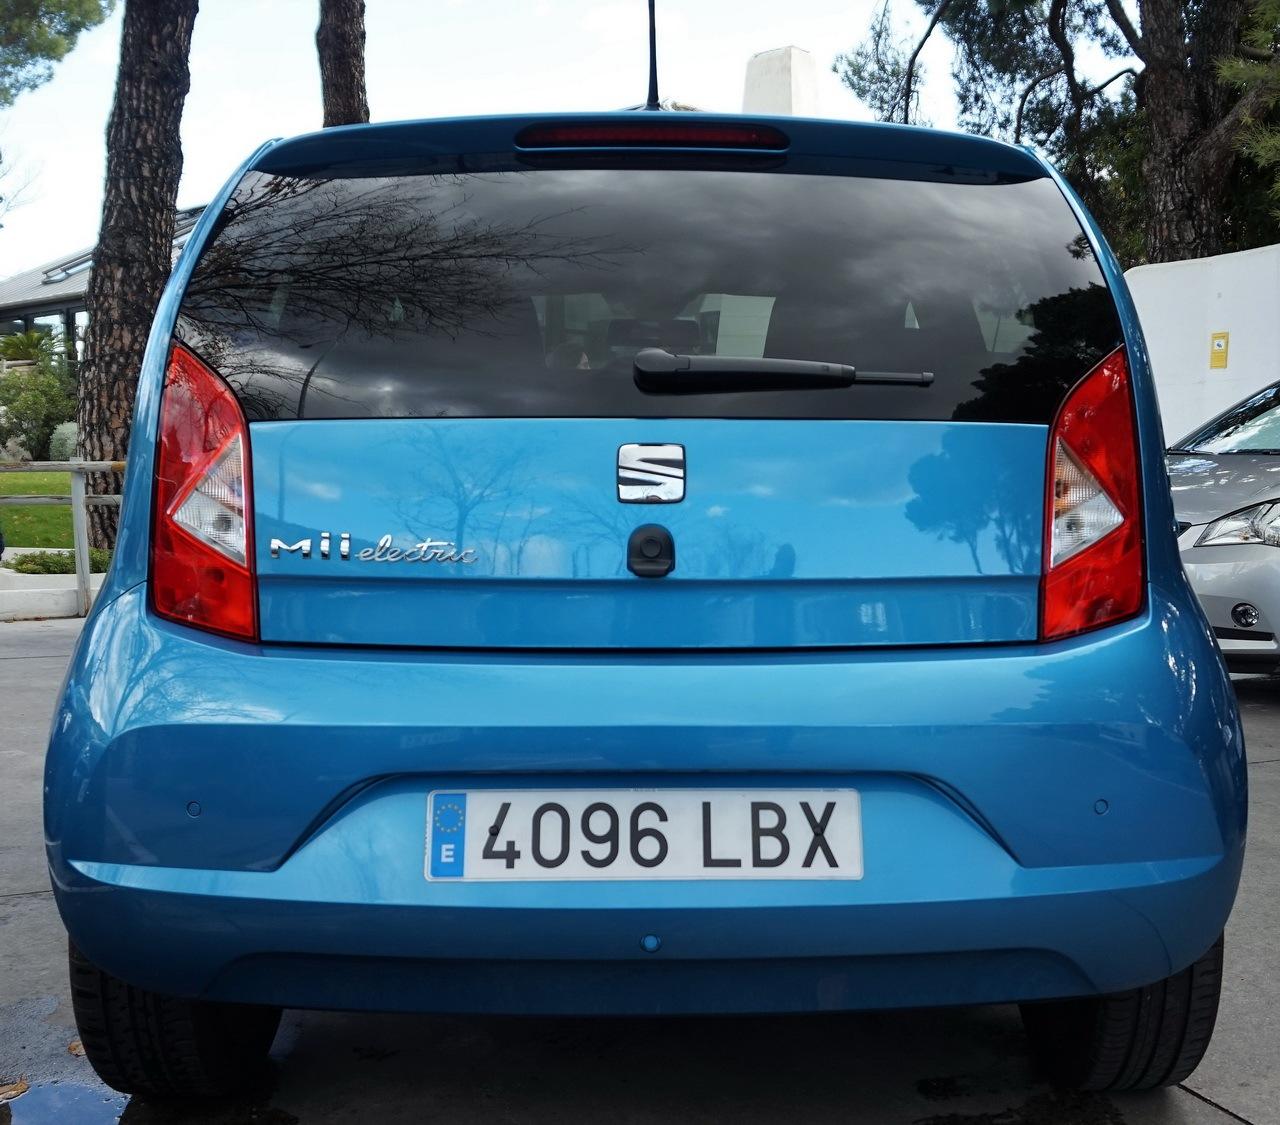 seat mii electric - test drive in anteprima